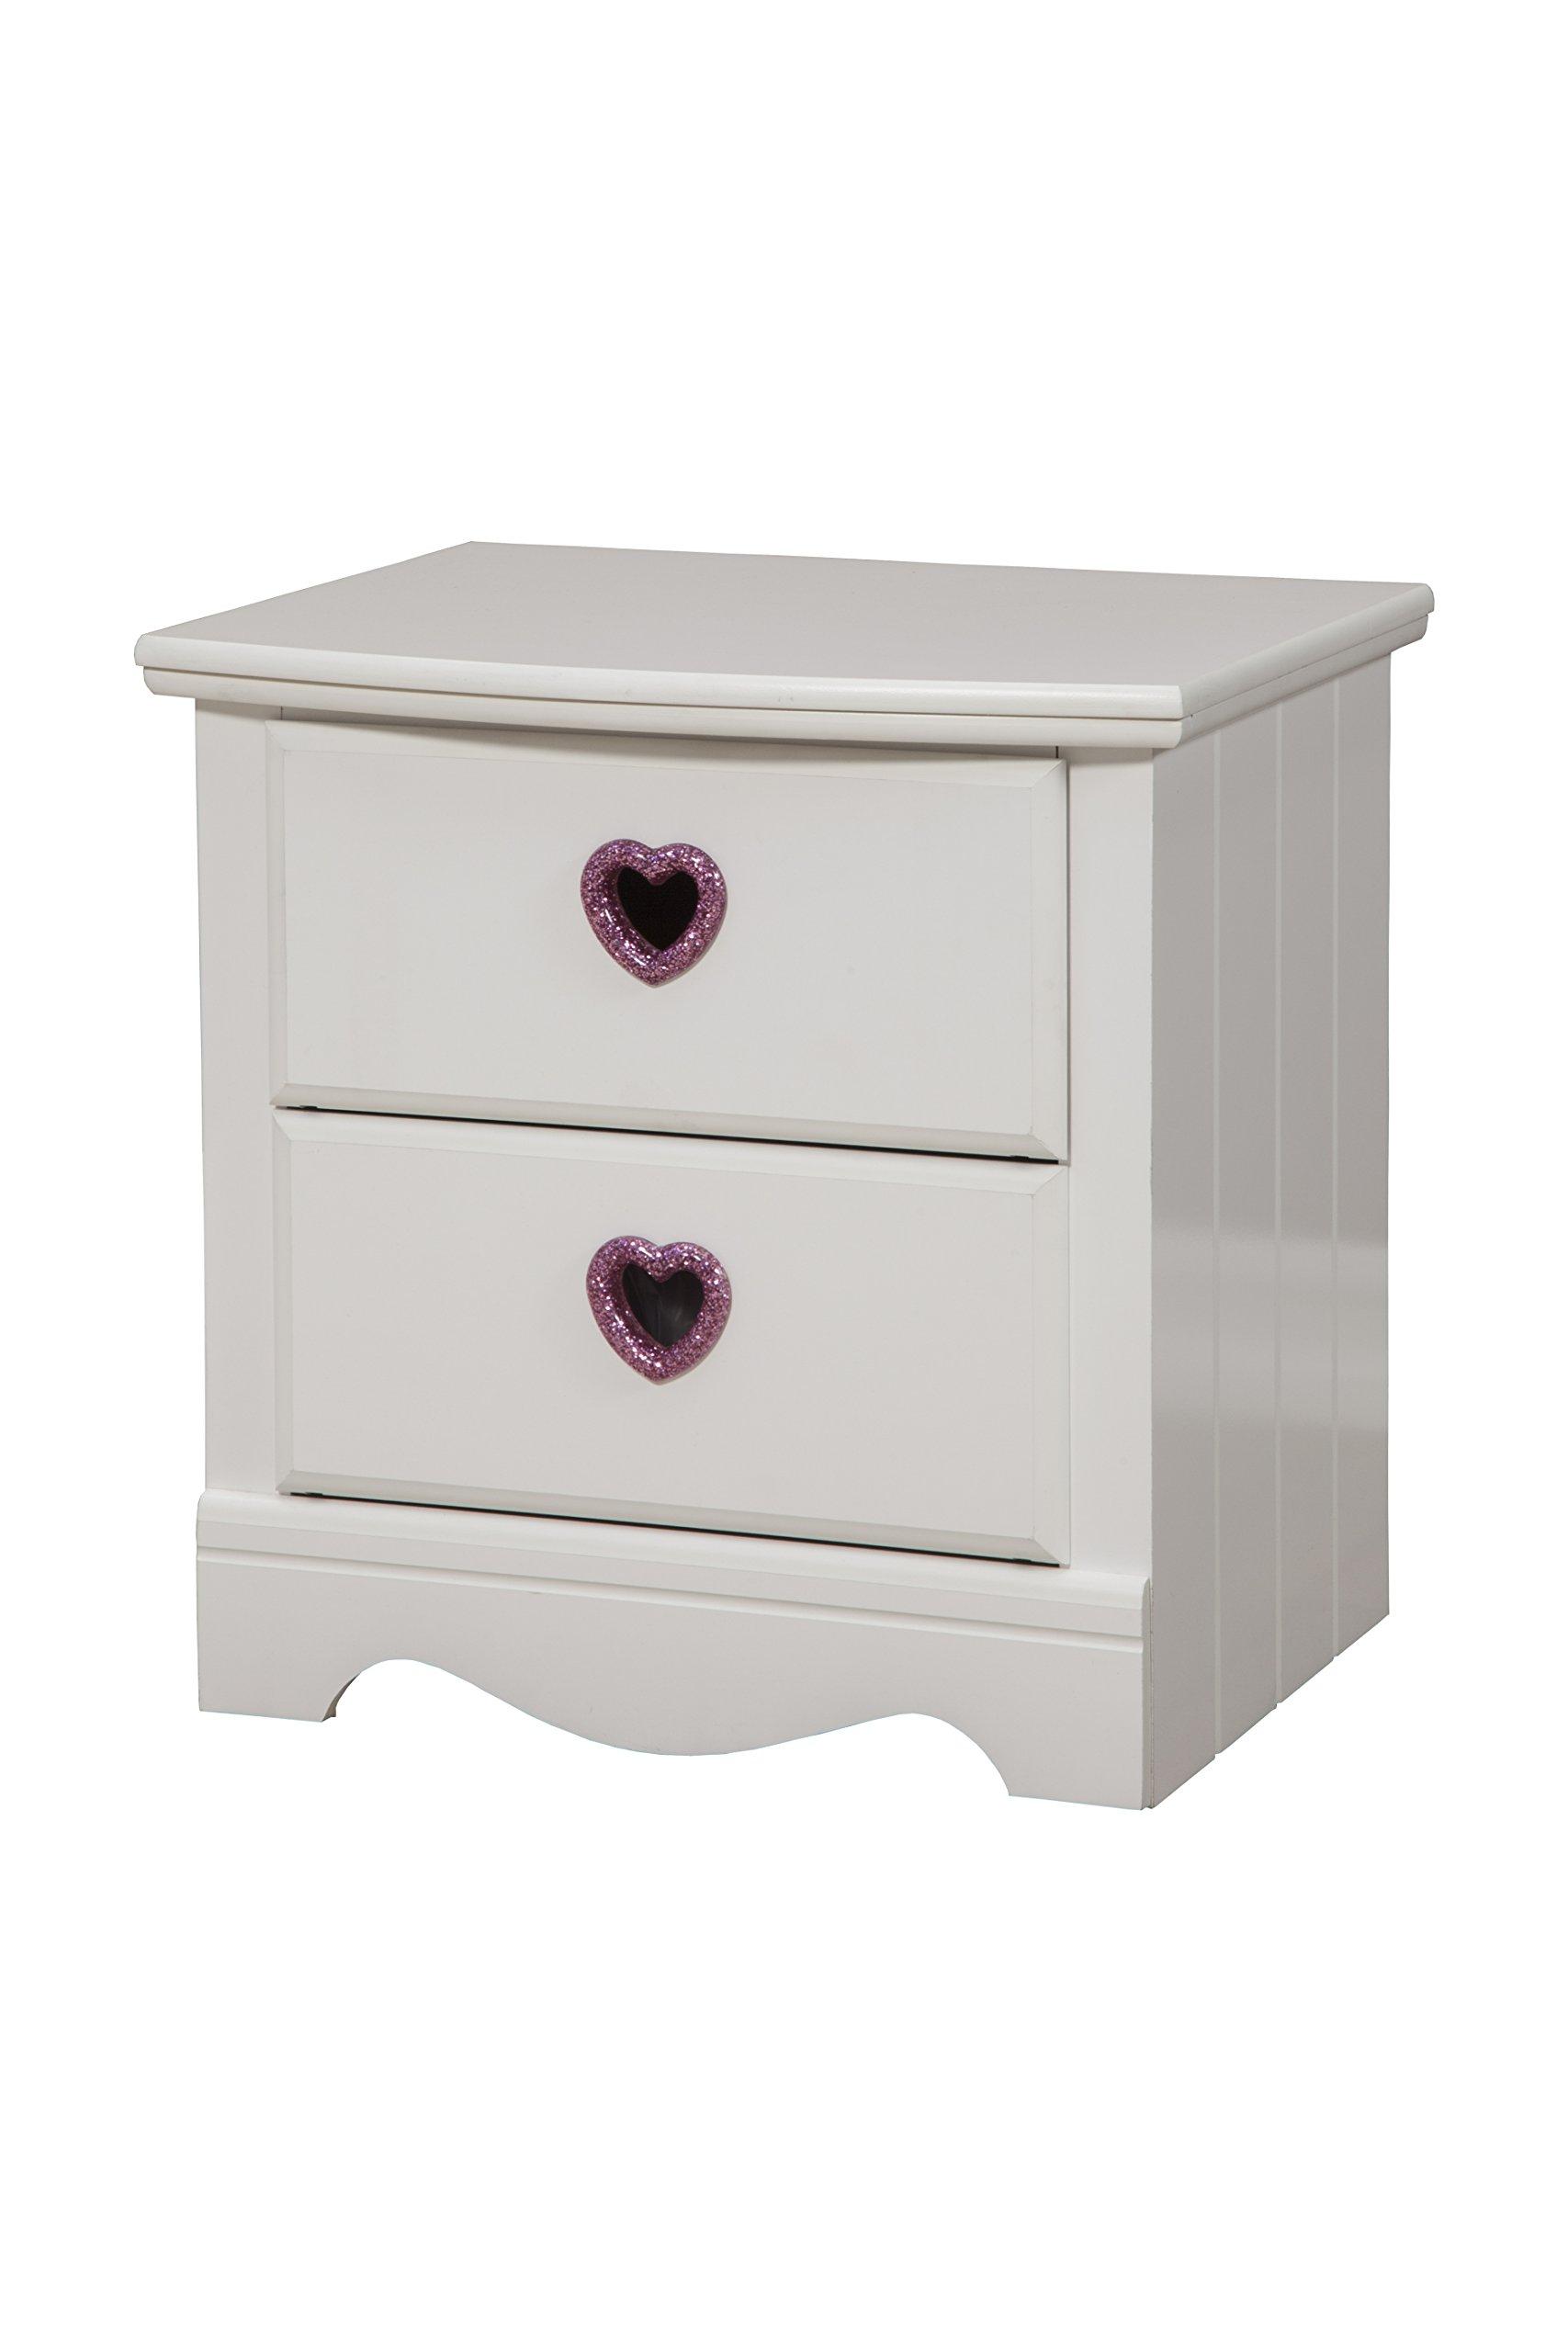 Sandberg Furniture Sparkling Hearts 2-Drawer Nightstand, Frost White